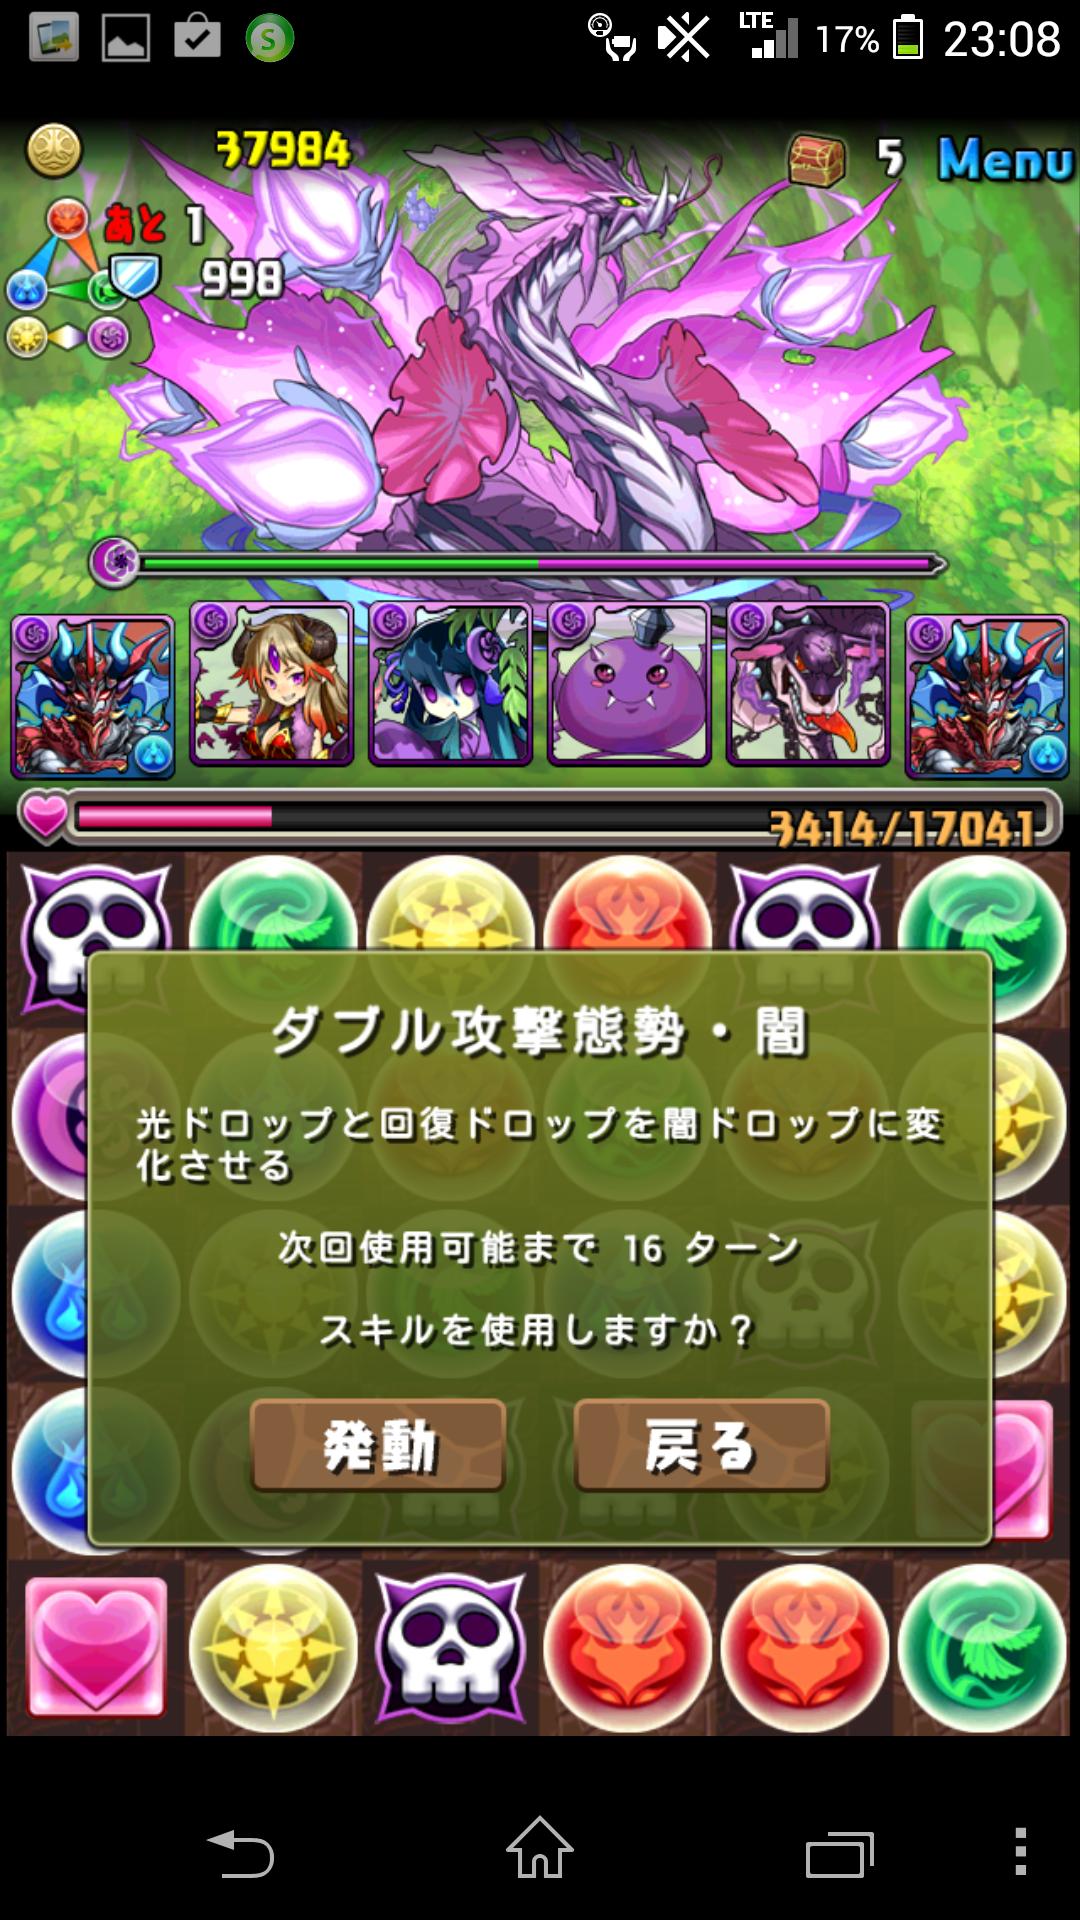 Screenshot_2014-04-22-23-08-37.png